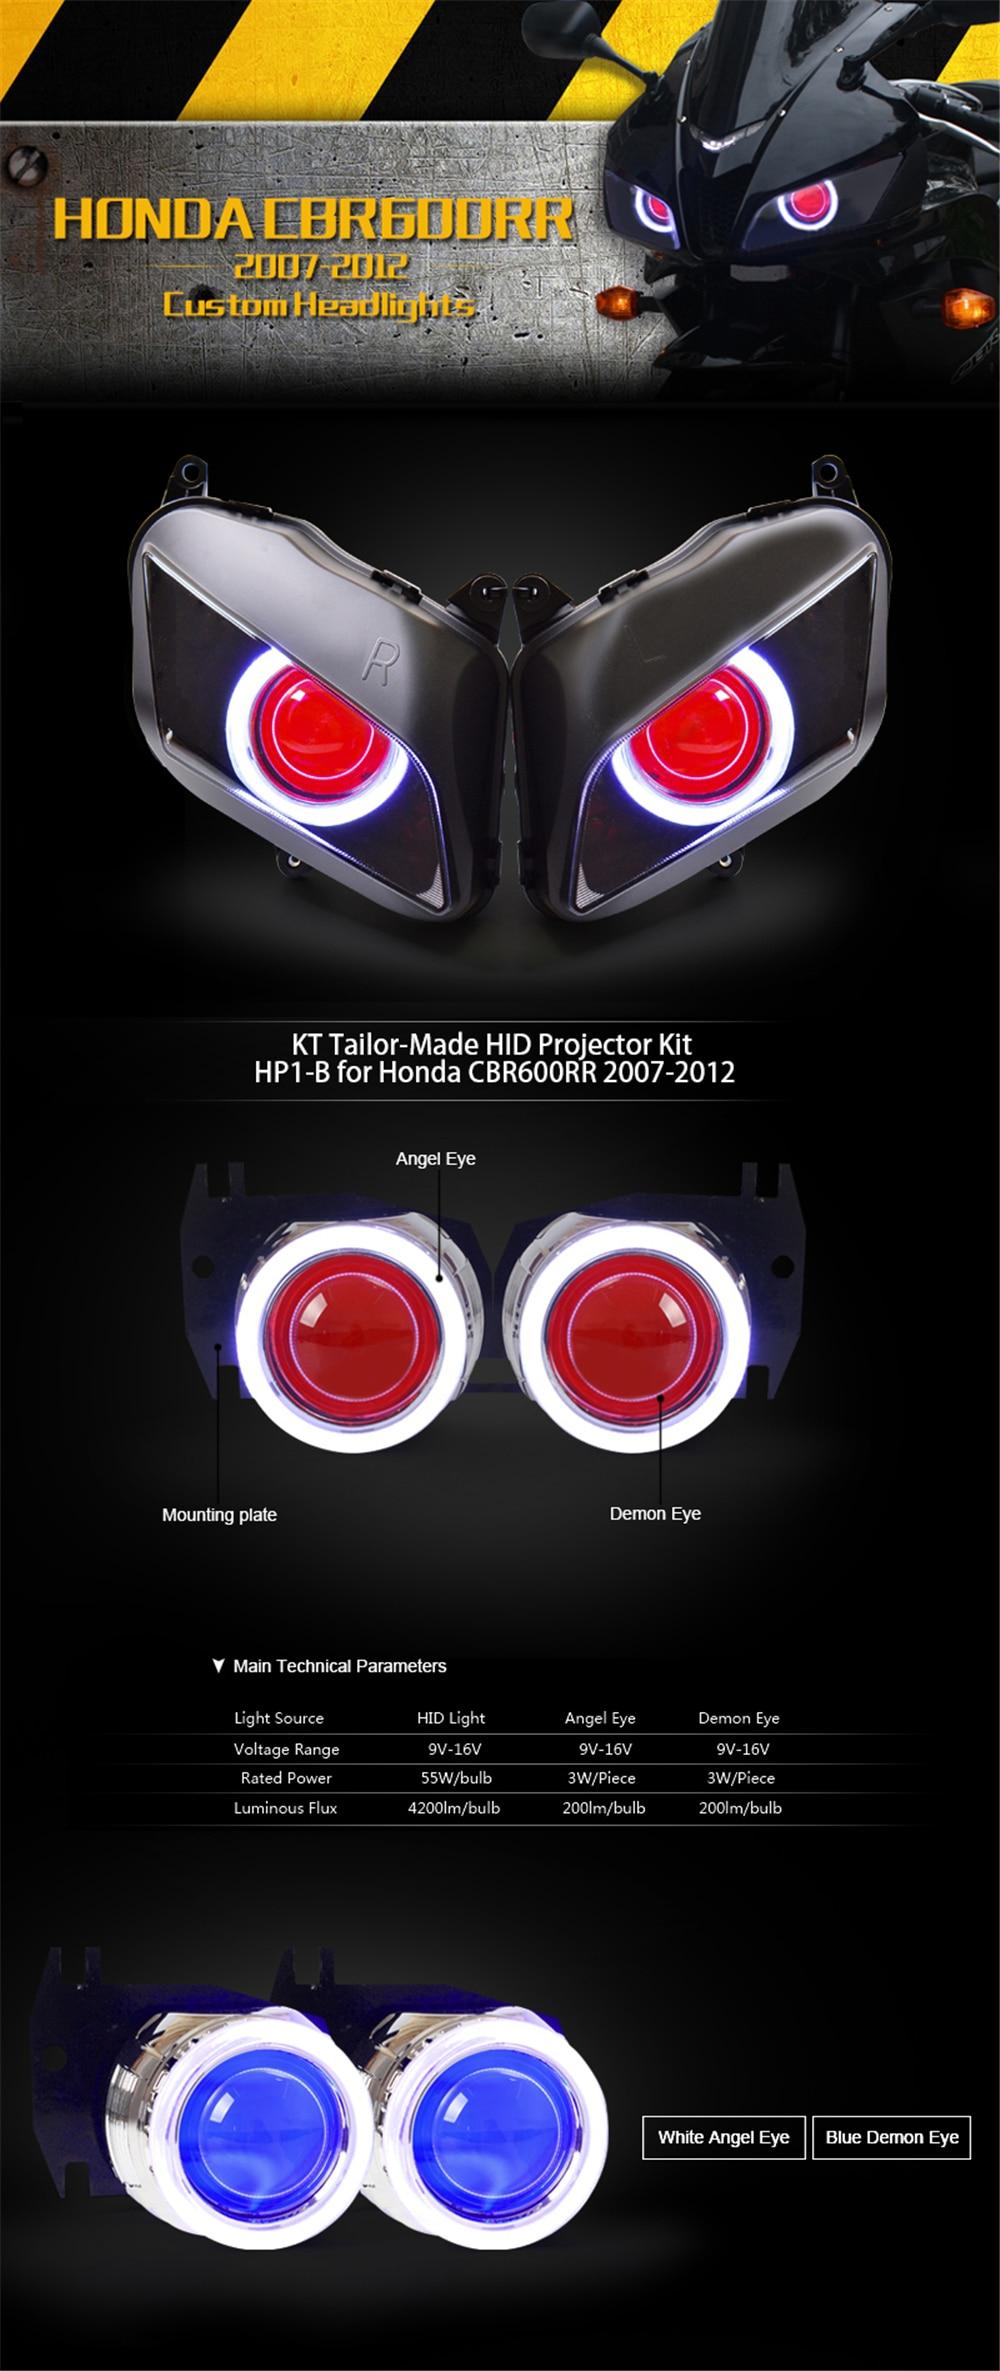 Kt Tailor Made Hid Projector Kit For Honda Cbr600rr 2007 2012 Hp1 B Custom Wiring Harness